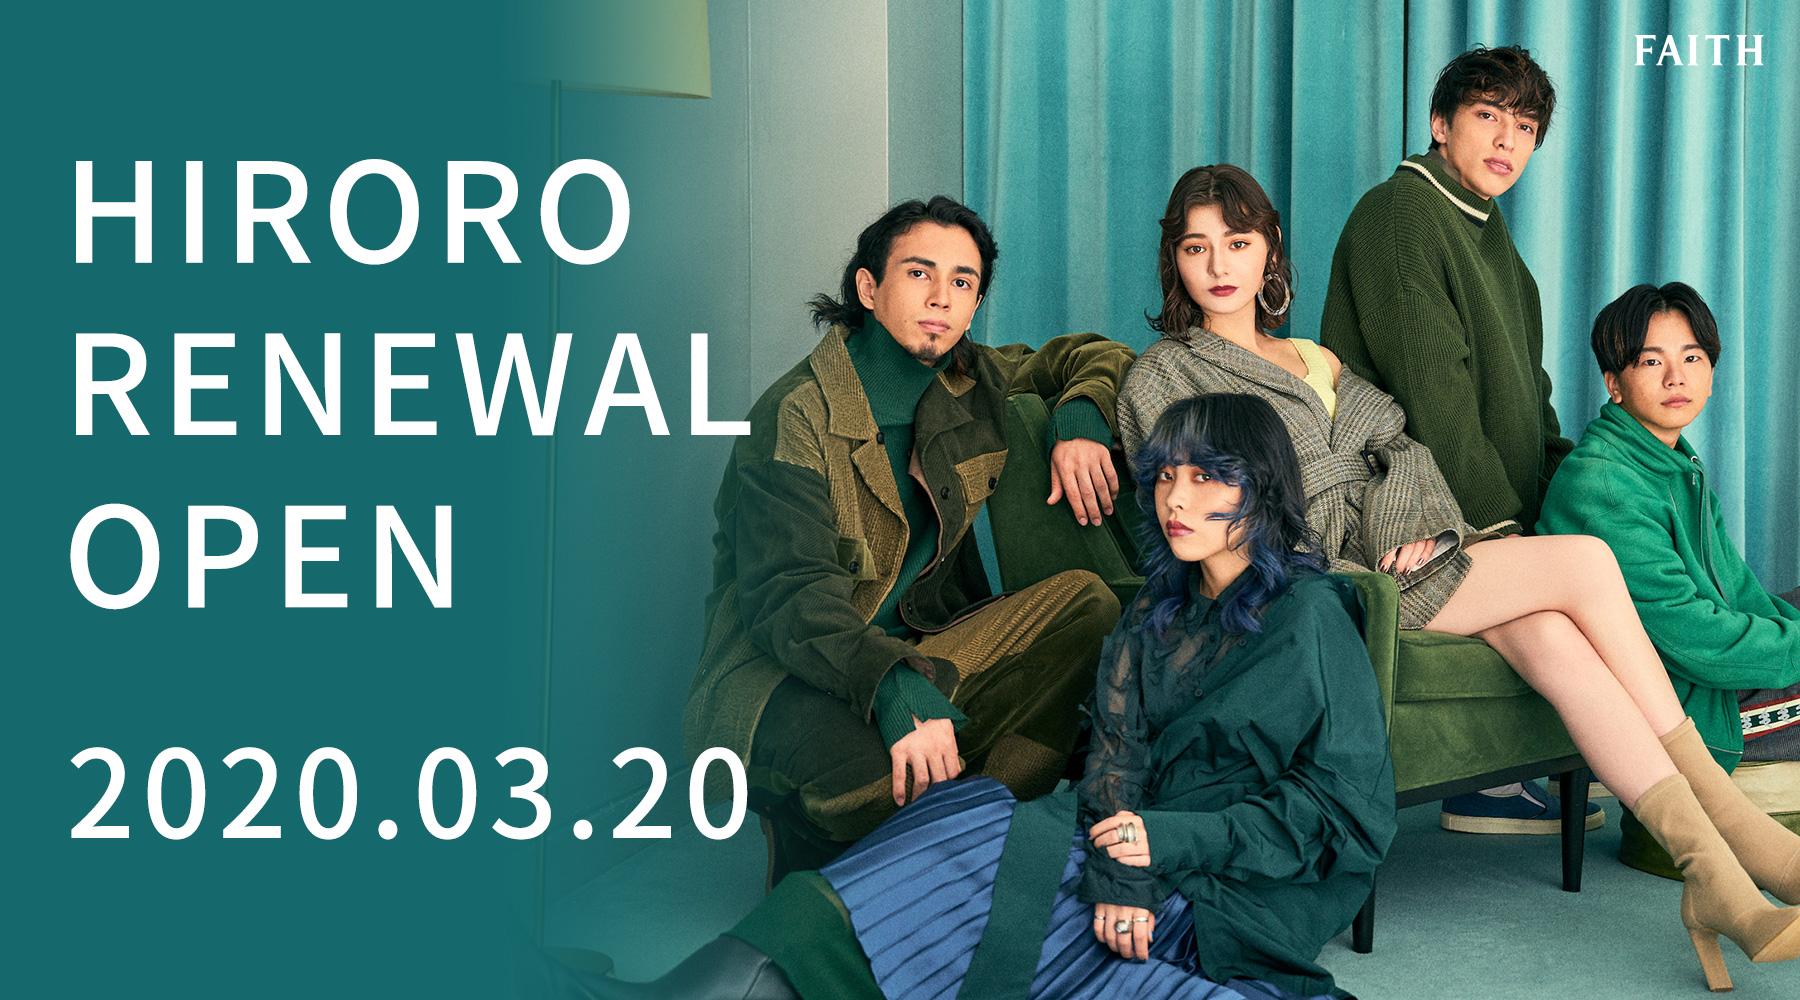 HIRORO RENEWAL OPEN 2020.03.20 FAITH